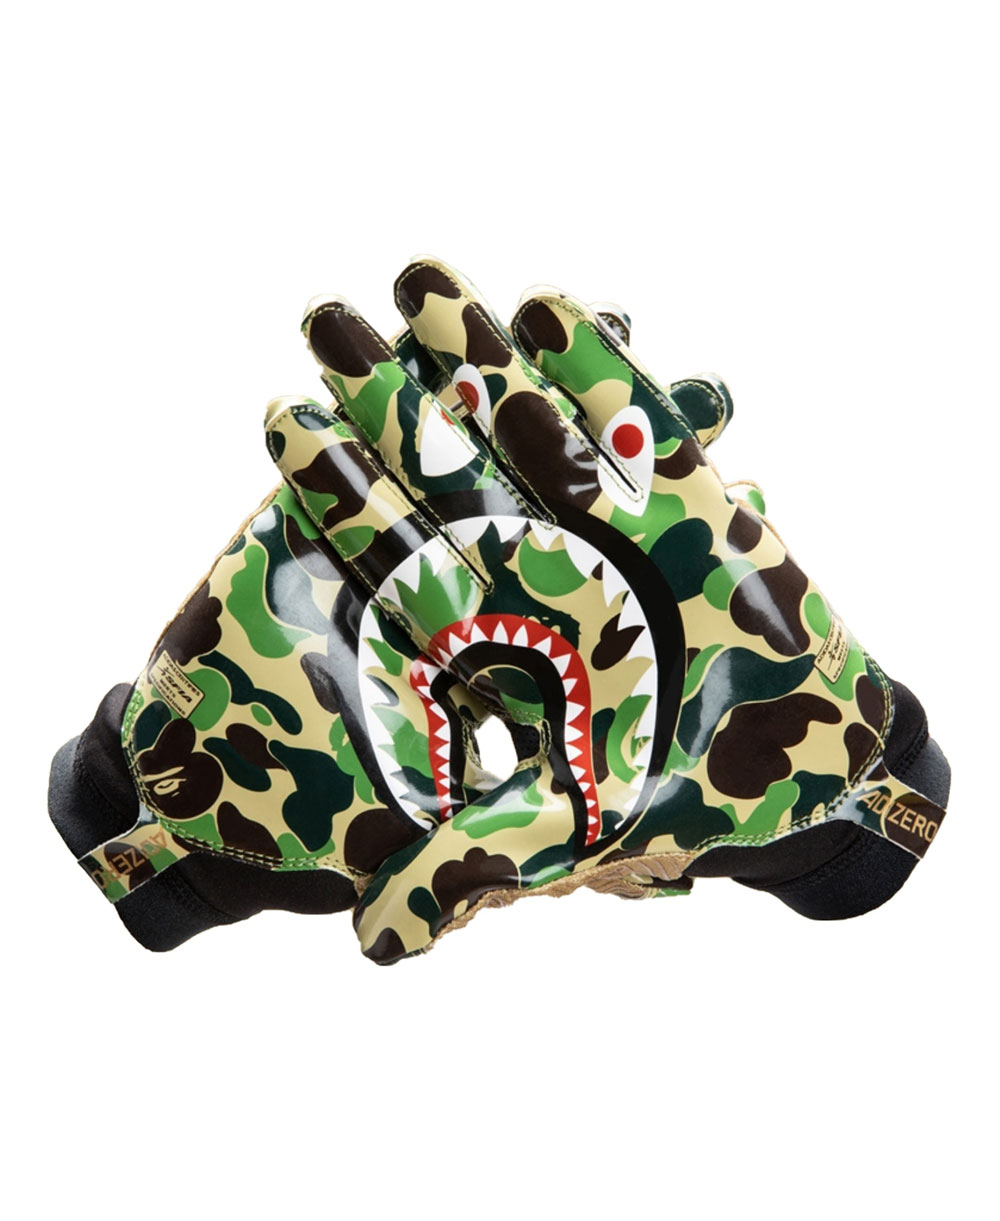 Bape x Adidas Adizero 8.0 Men's Football Gloves